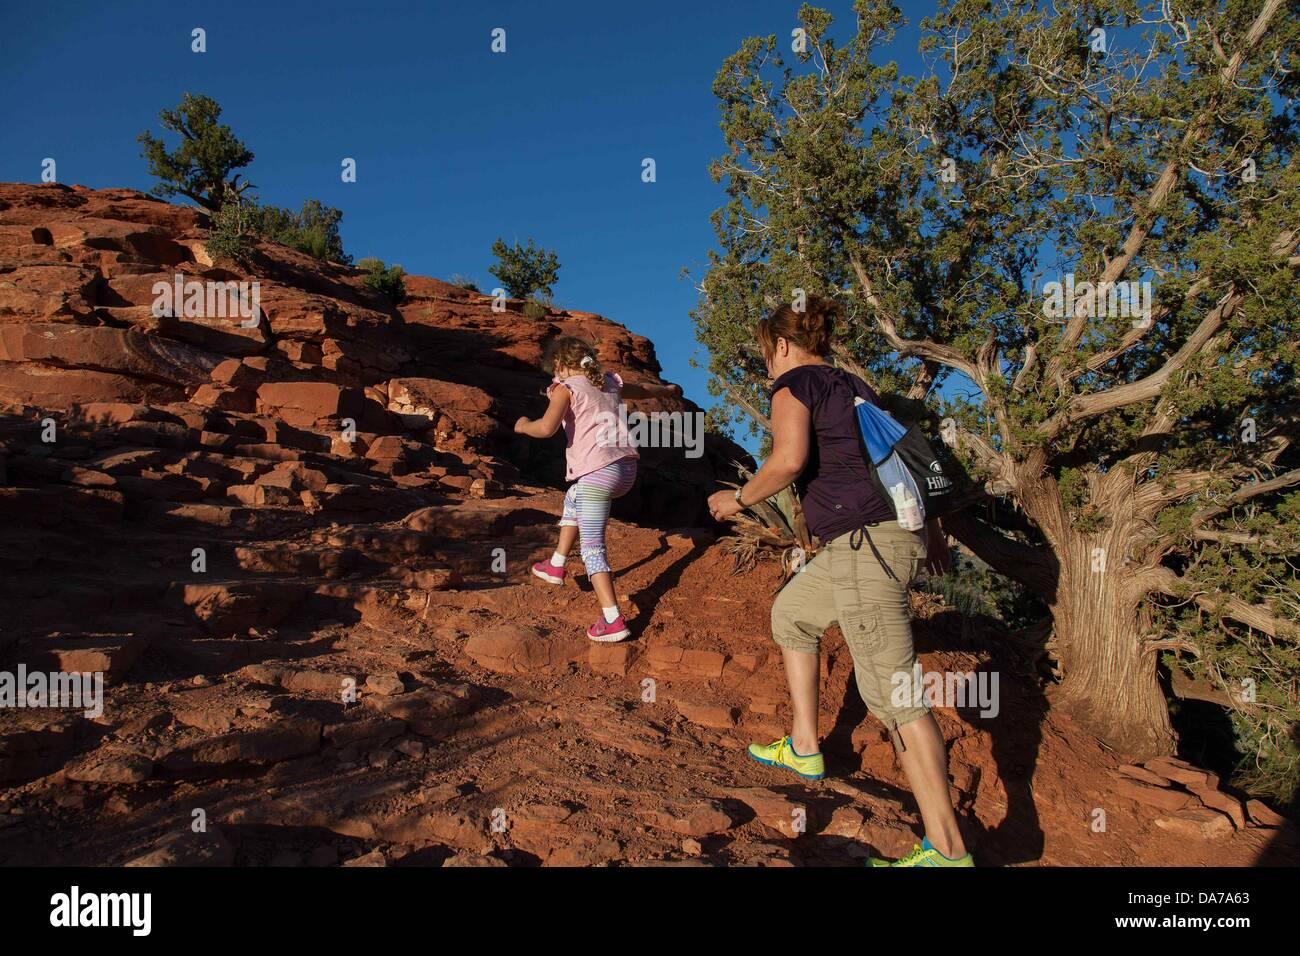 Visit Sedona Stock Photos & Visit Sedona Stock Images - Alamy